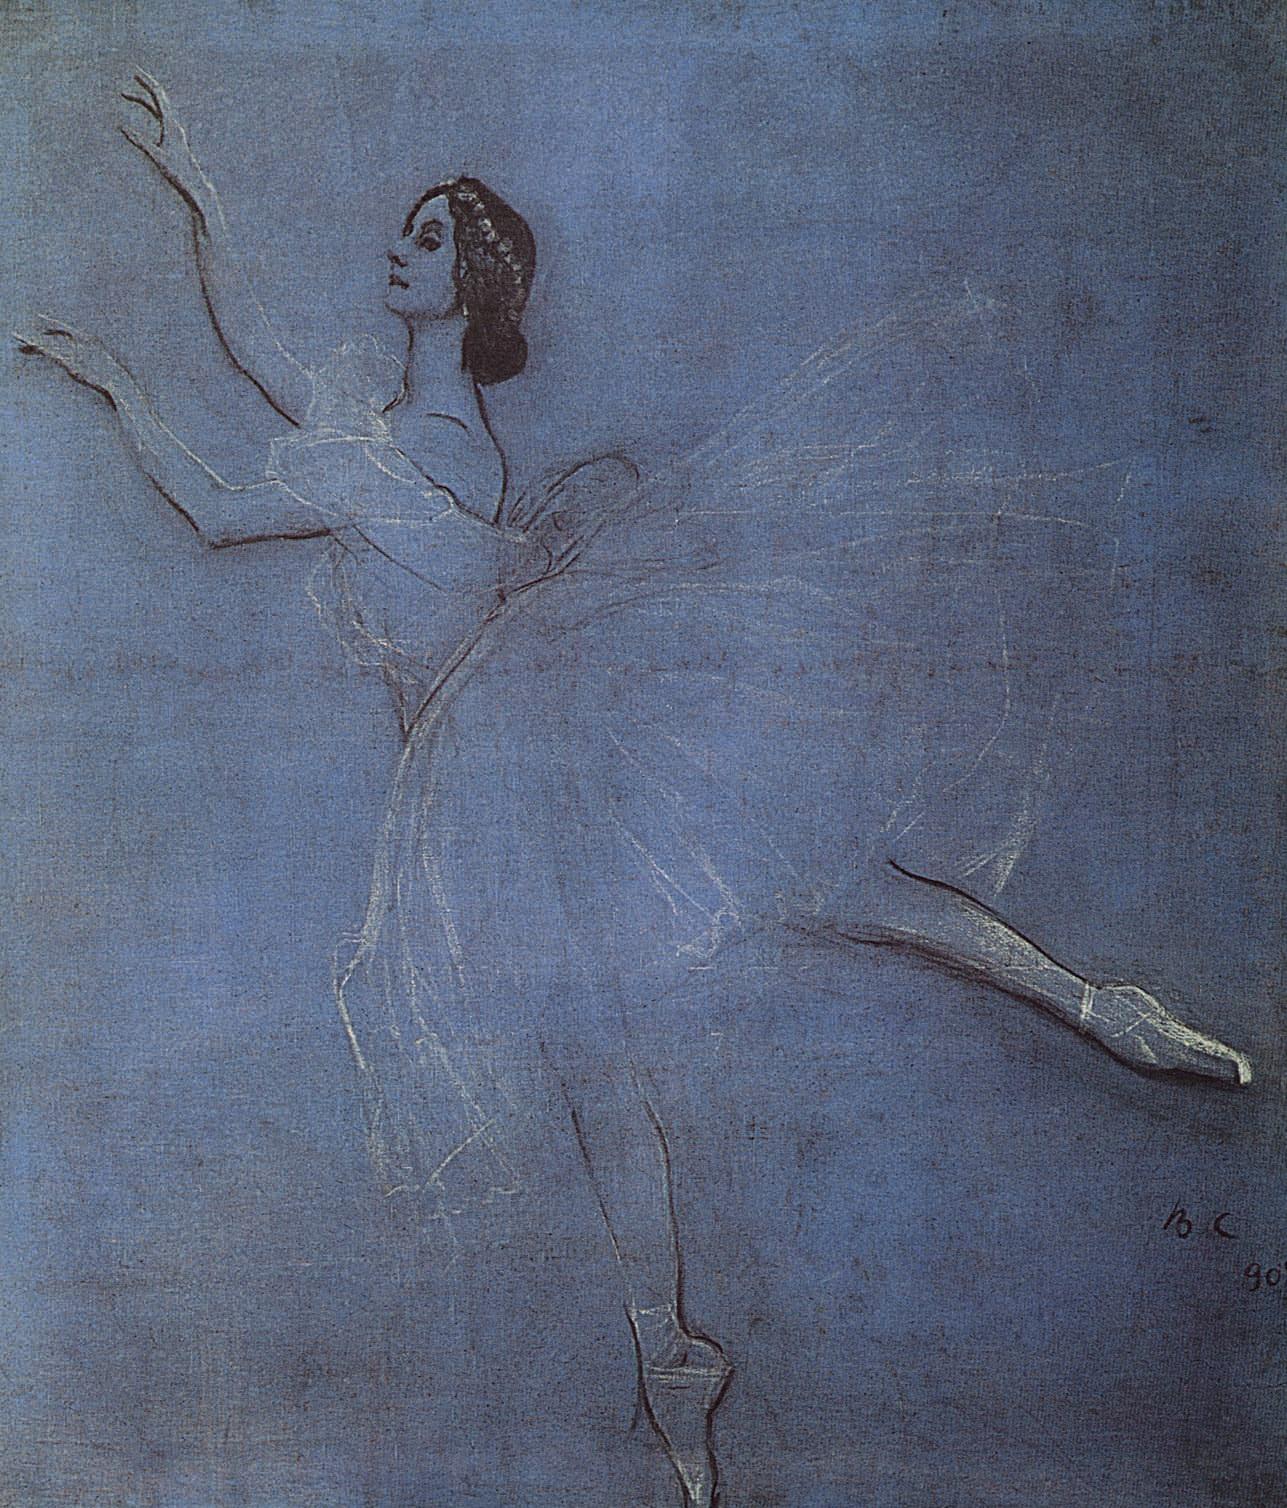 File:Anna Pavlova in the Ballet Sylphyde.jpg - Wikimedia Commons